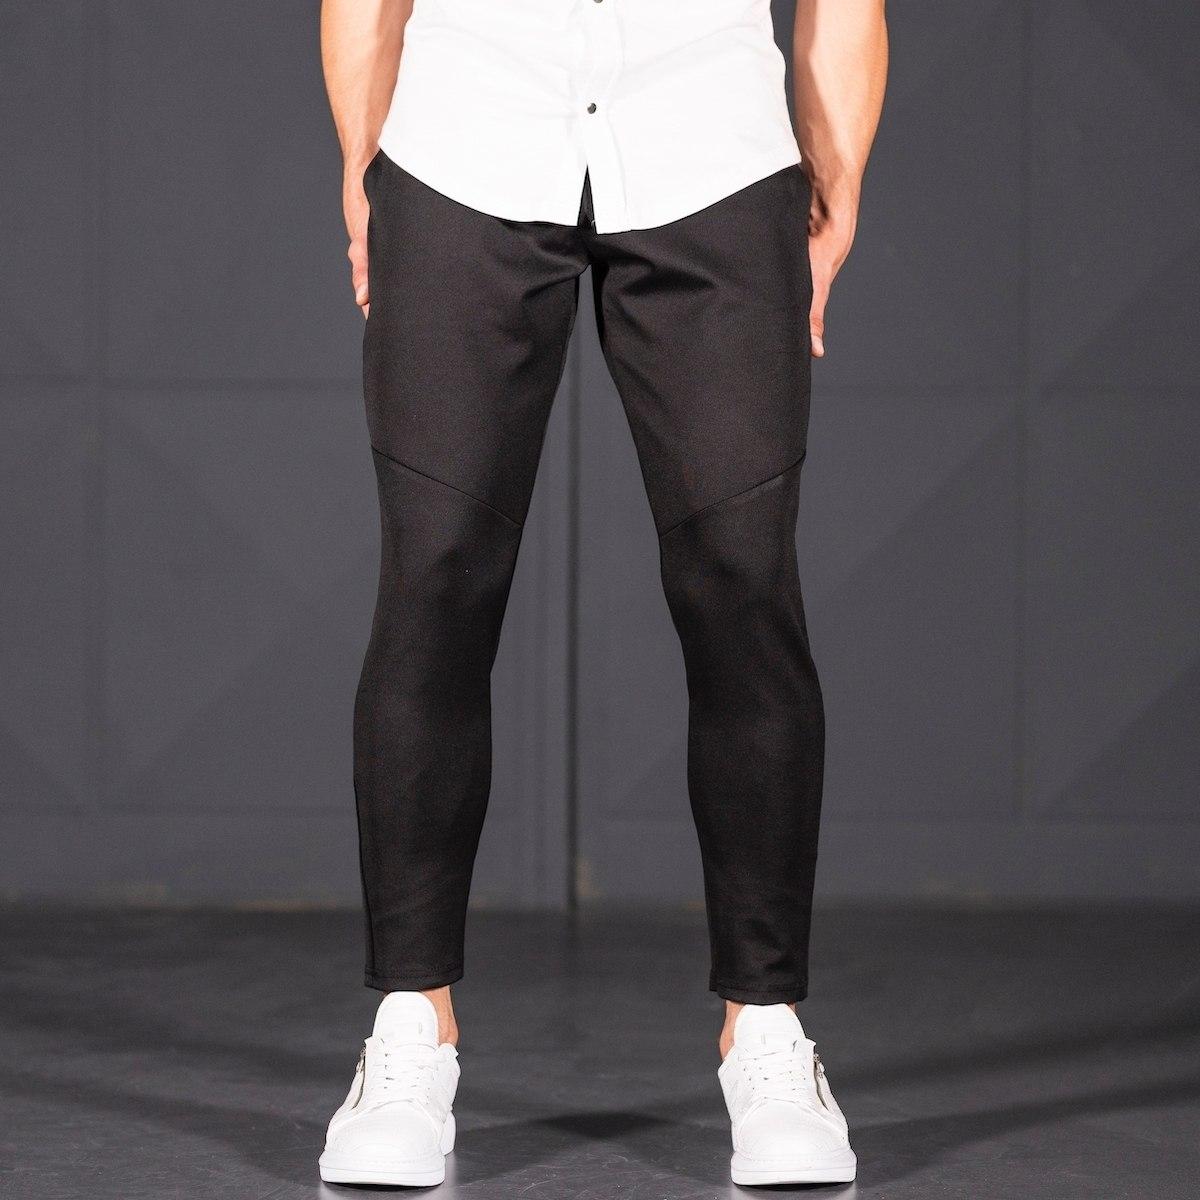 Horizonal Stitched Joggers In Black Mv Premium Brand - 1